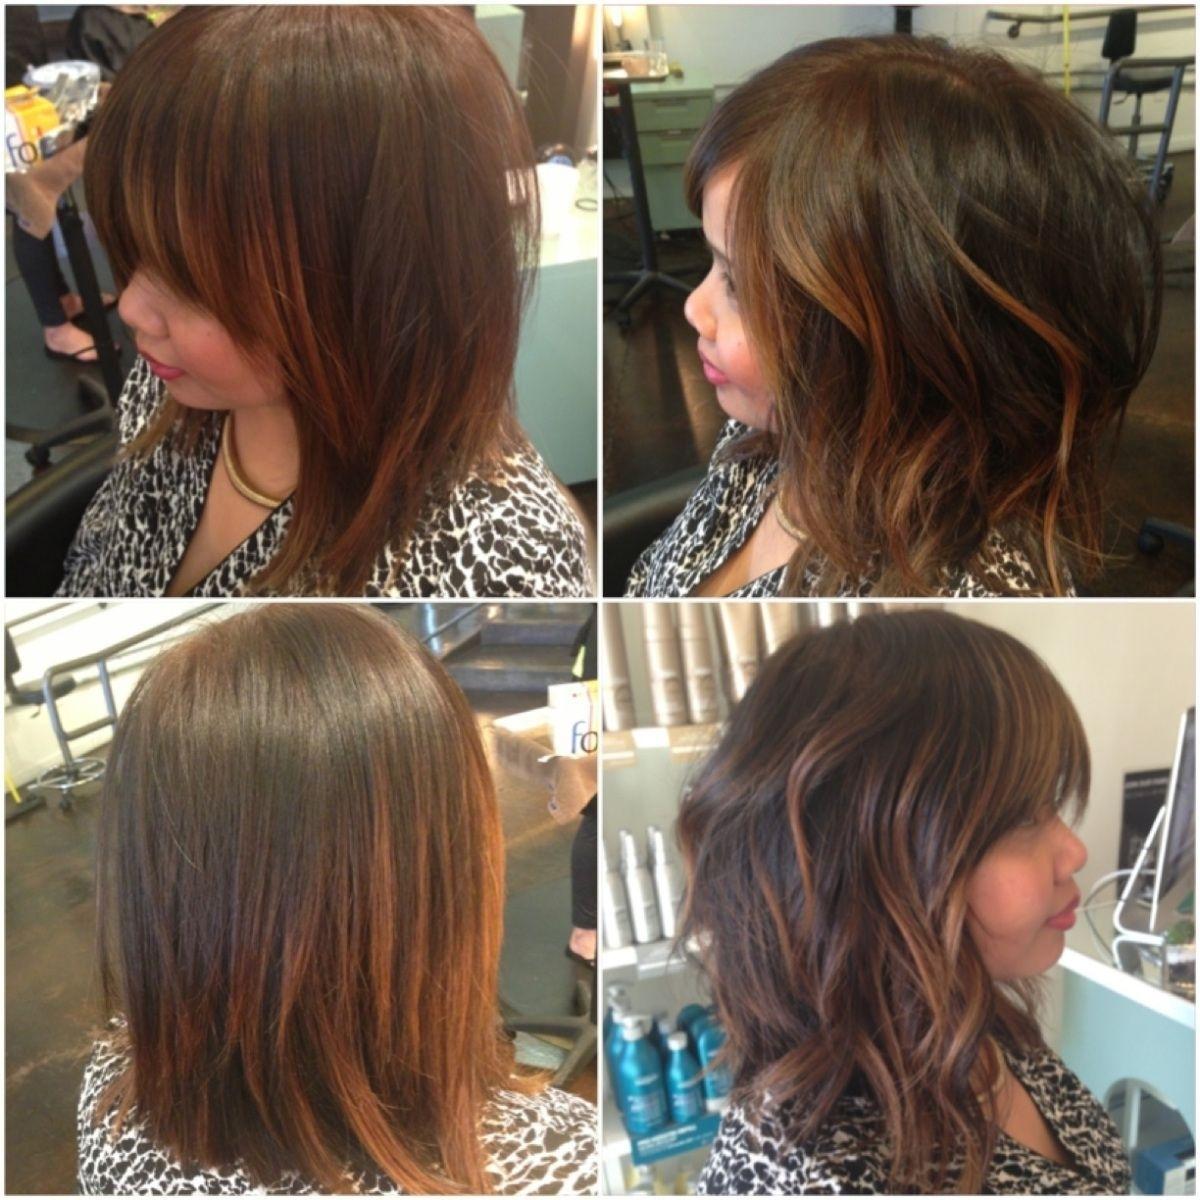 Long Bob, Lob, Balayage, San Diego Balayage Specialist, Hair Color regarding Best Haircut Salon In San Diego